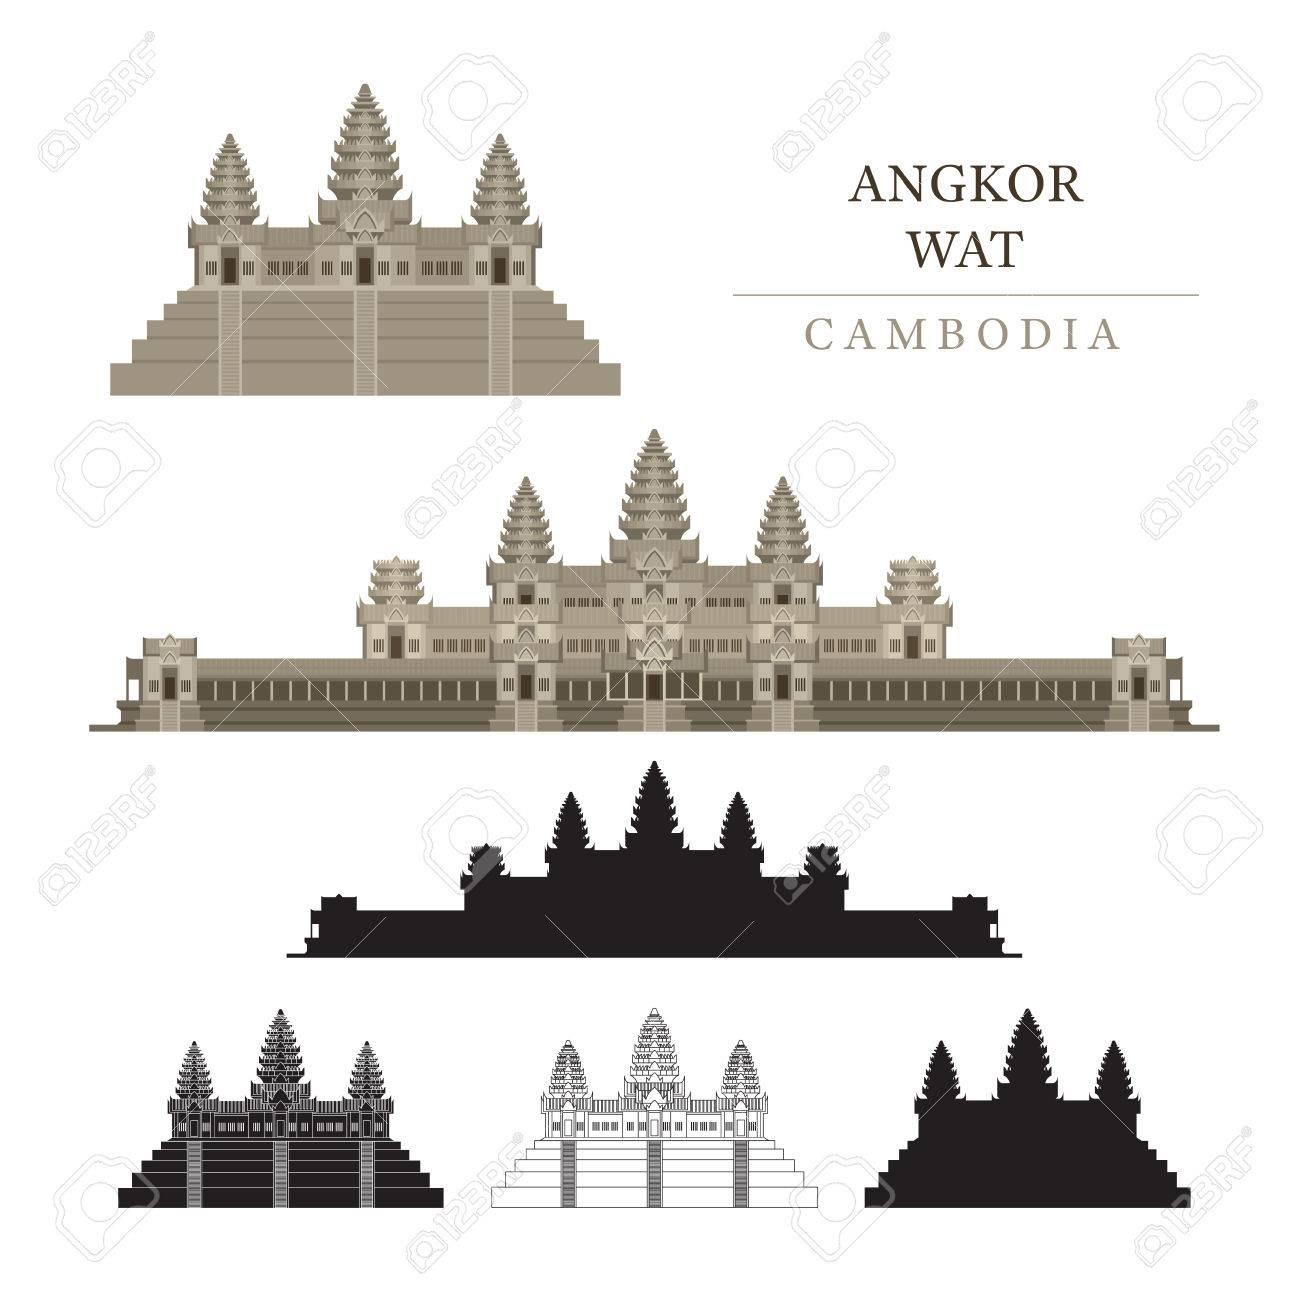 Angkor wat free vector art (157 free downloads).